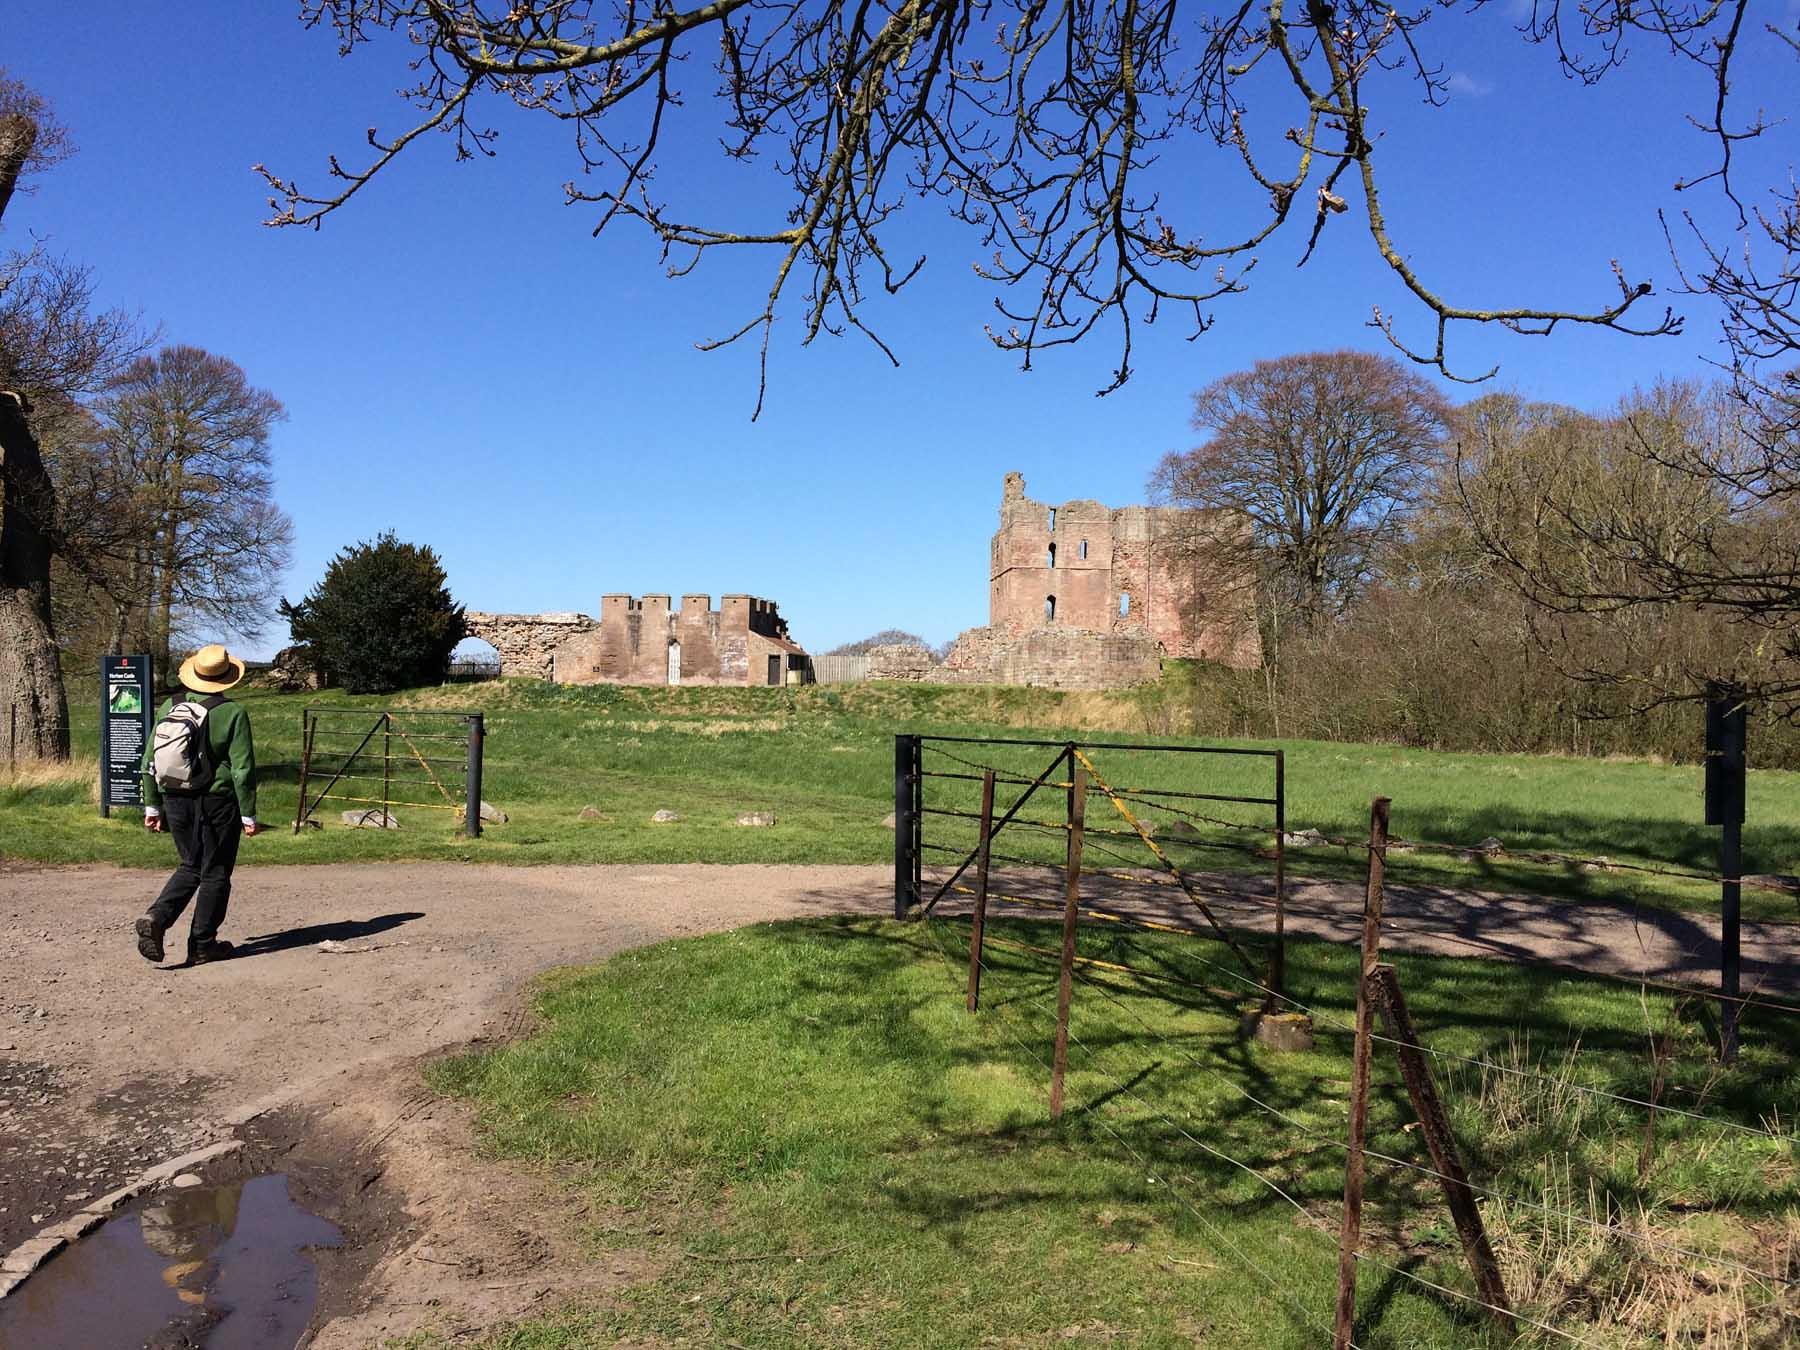 arrive at Norham castle